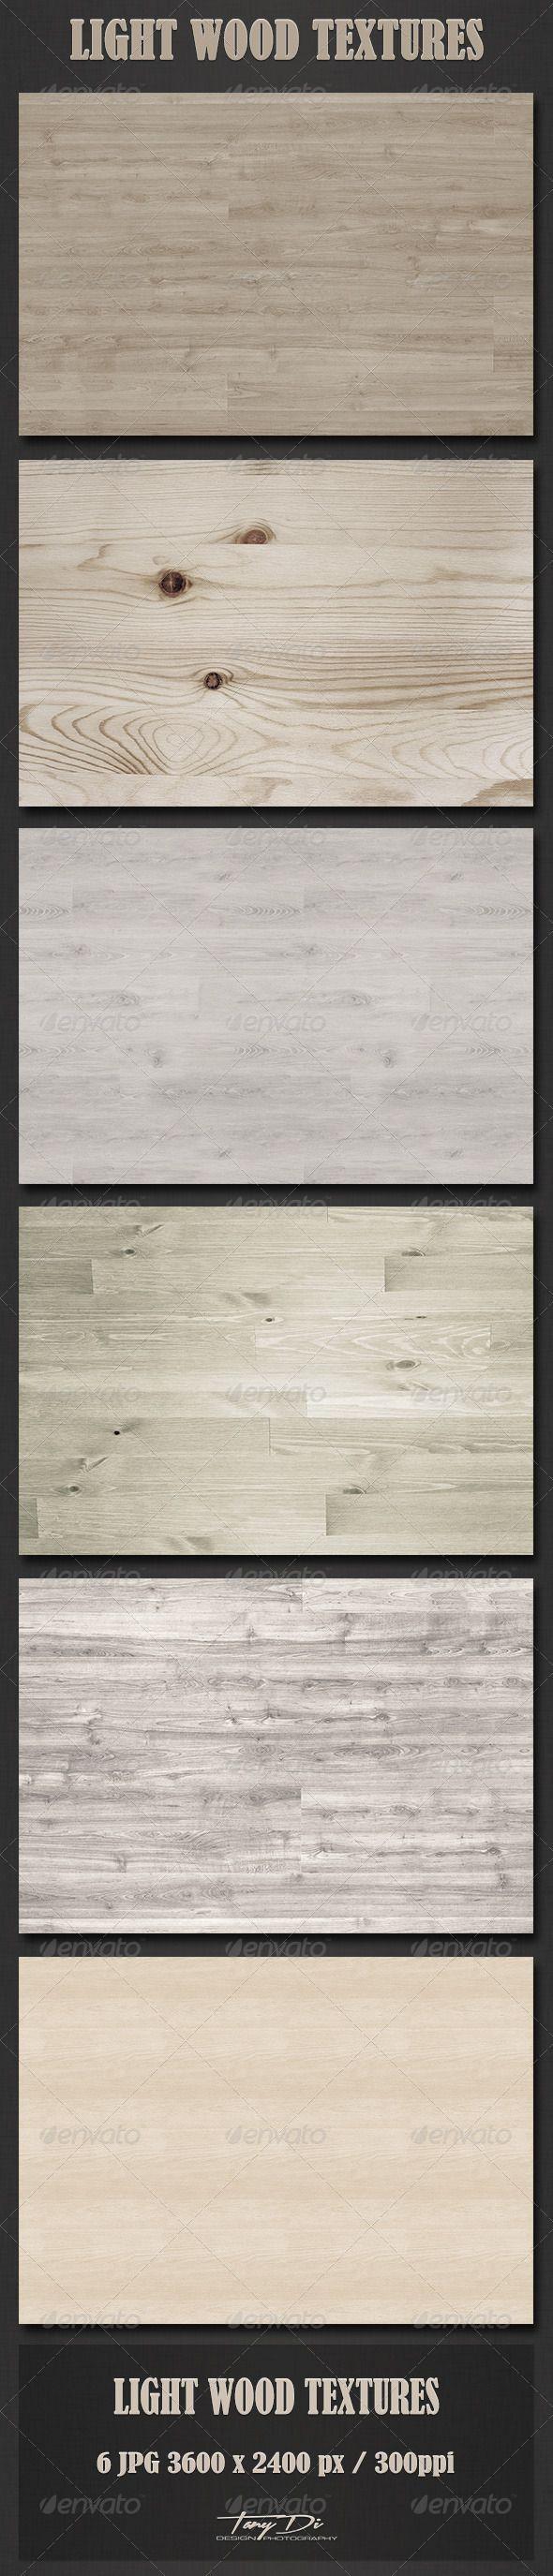 Light Wood Textures